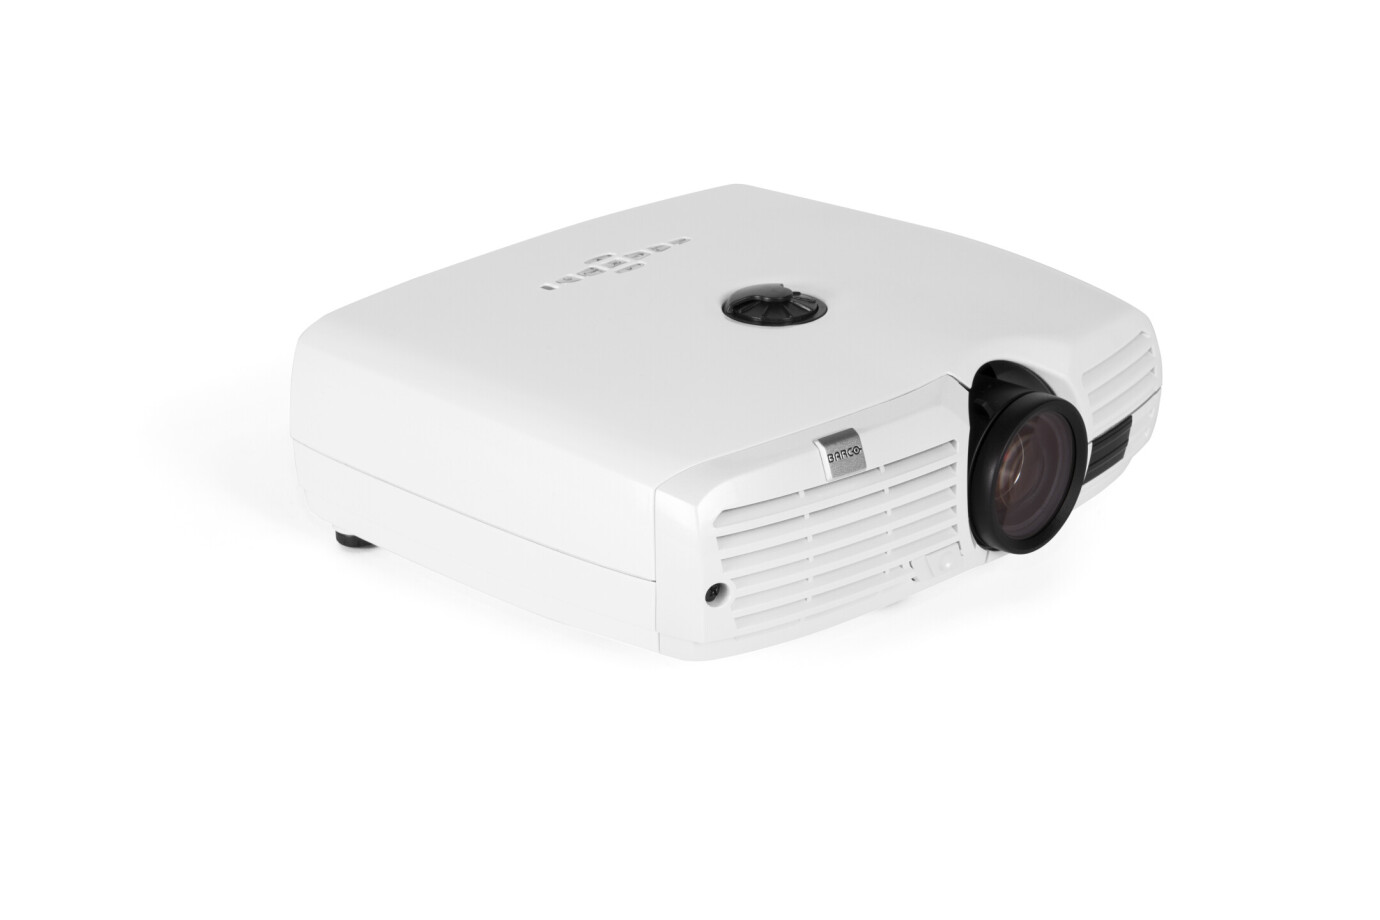 Barco CVHD-31B Business Beamer mit 3000 ANSI-Lumen und Full-HD